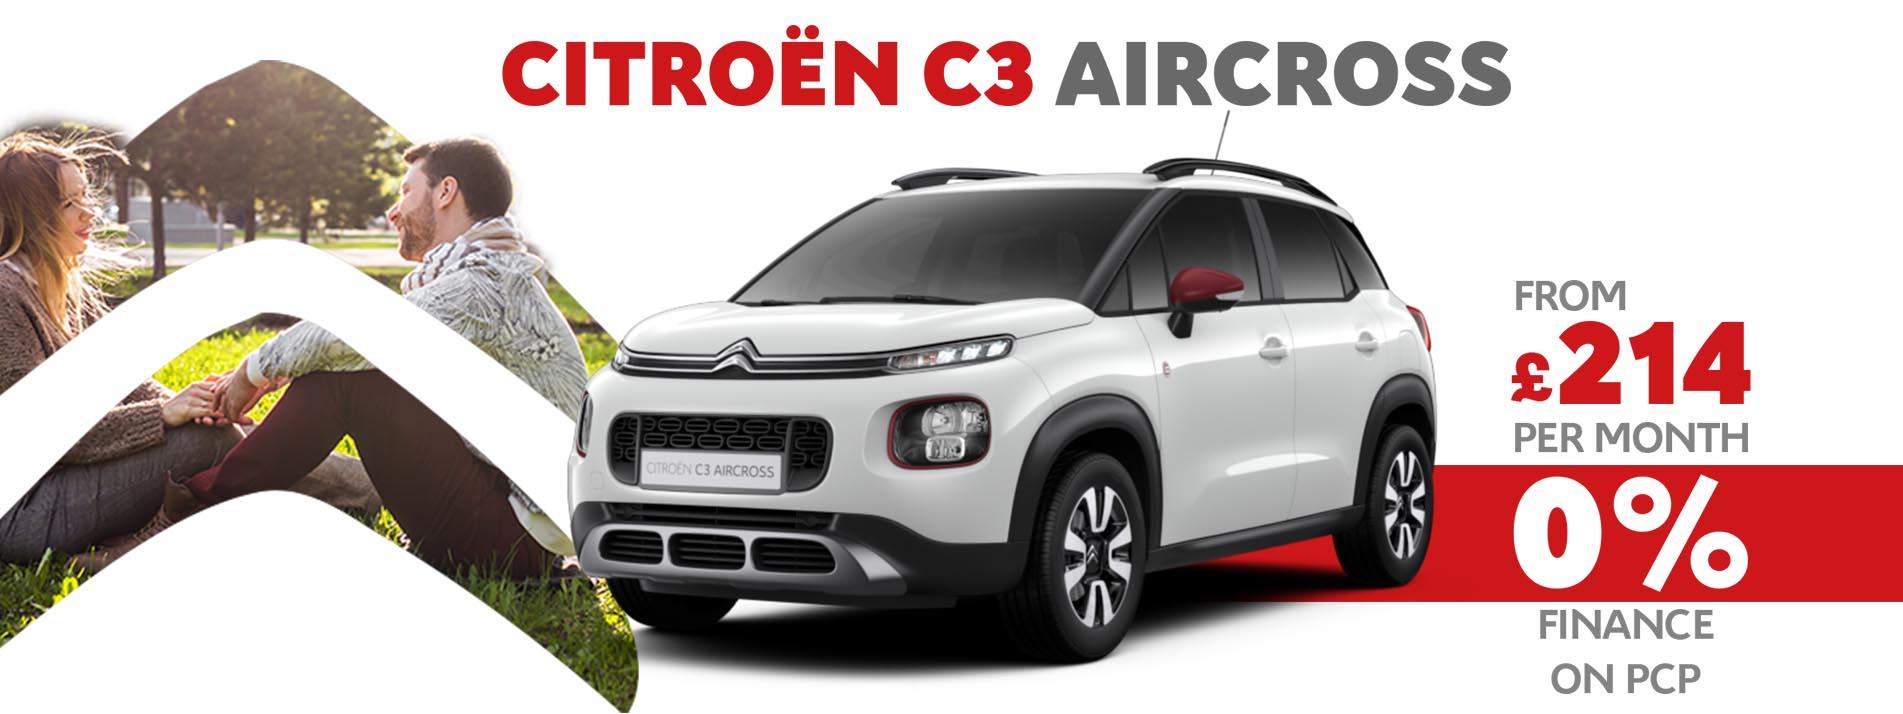 zero-percent-apr-c3-aircross-suv-2-m-sli